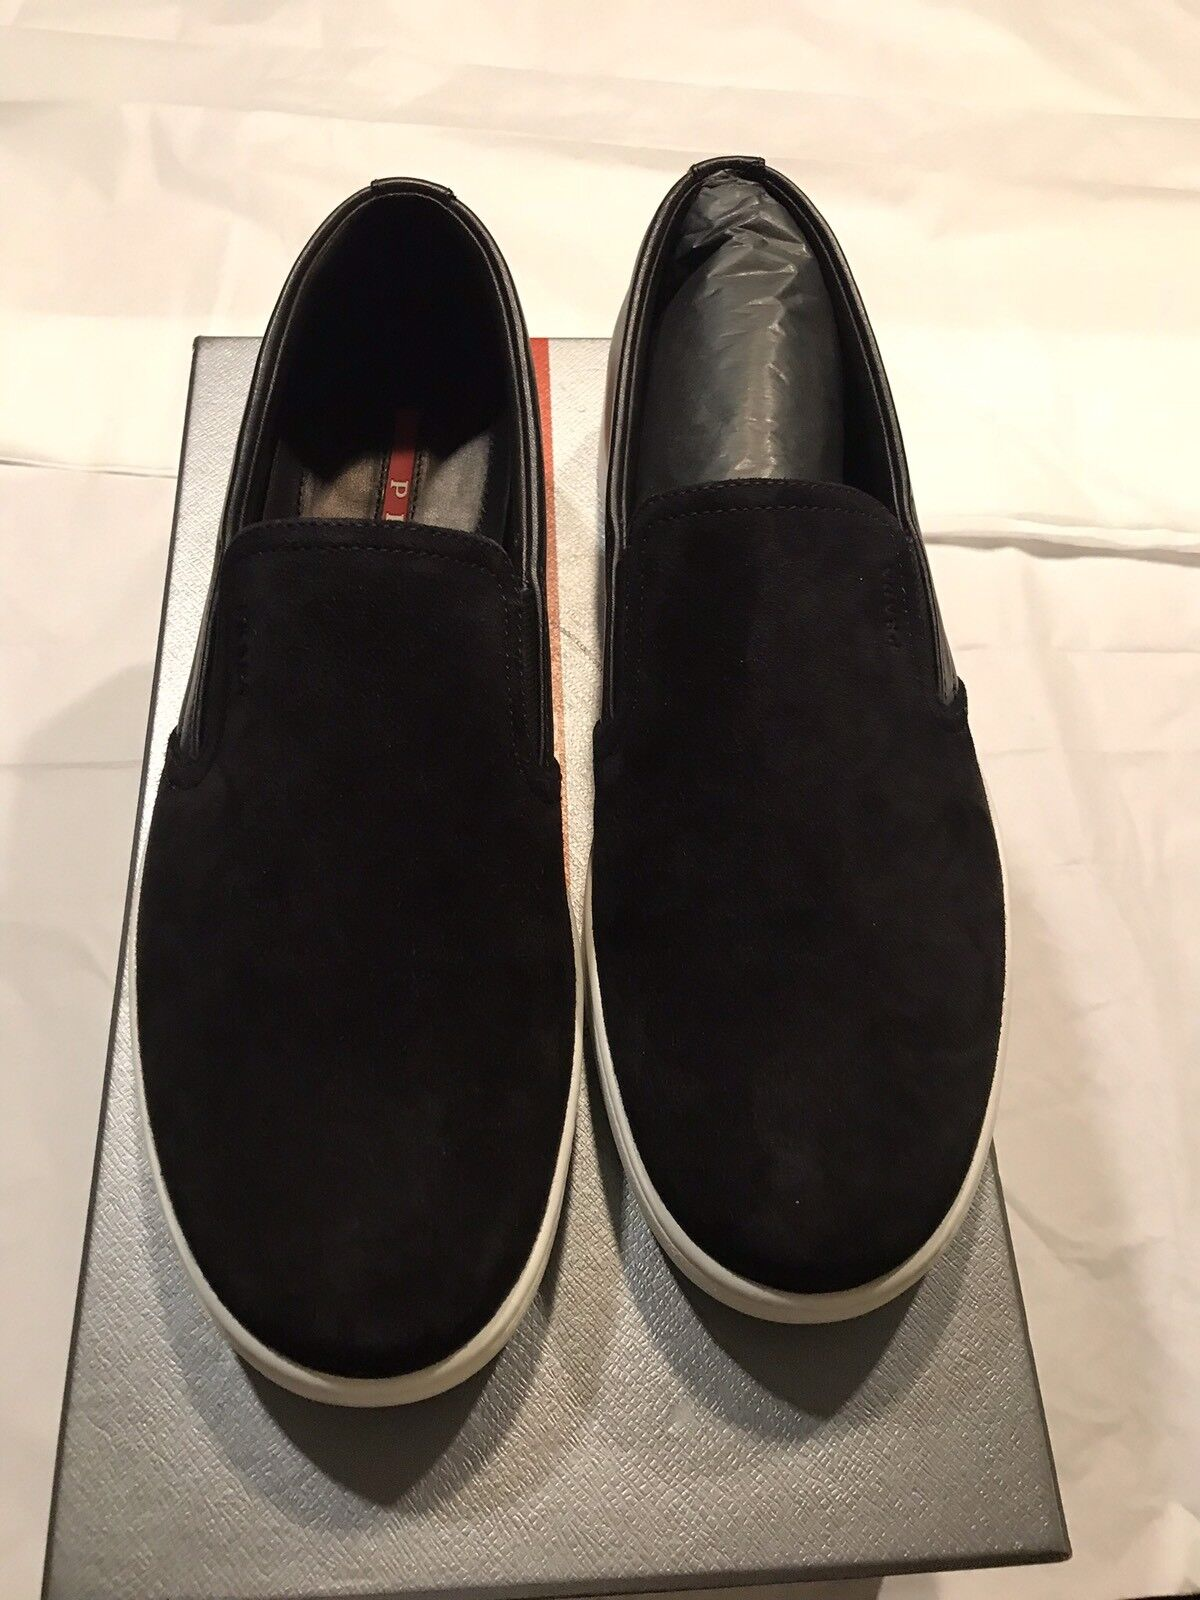 New Authentic Prada Mixed Media Men Leather Suede SlipOn scarpe da ginnastica nero 7.5  690